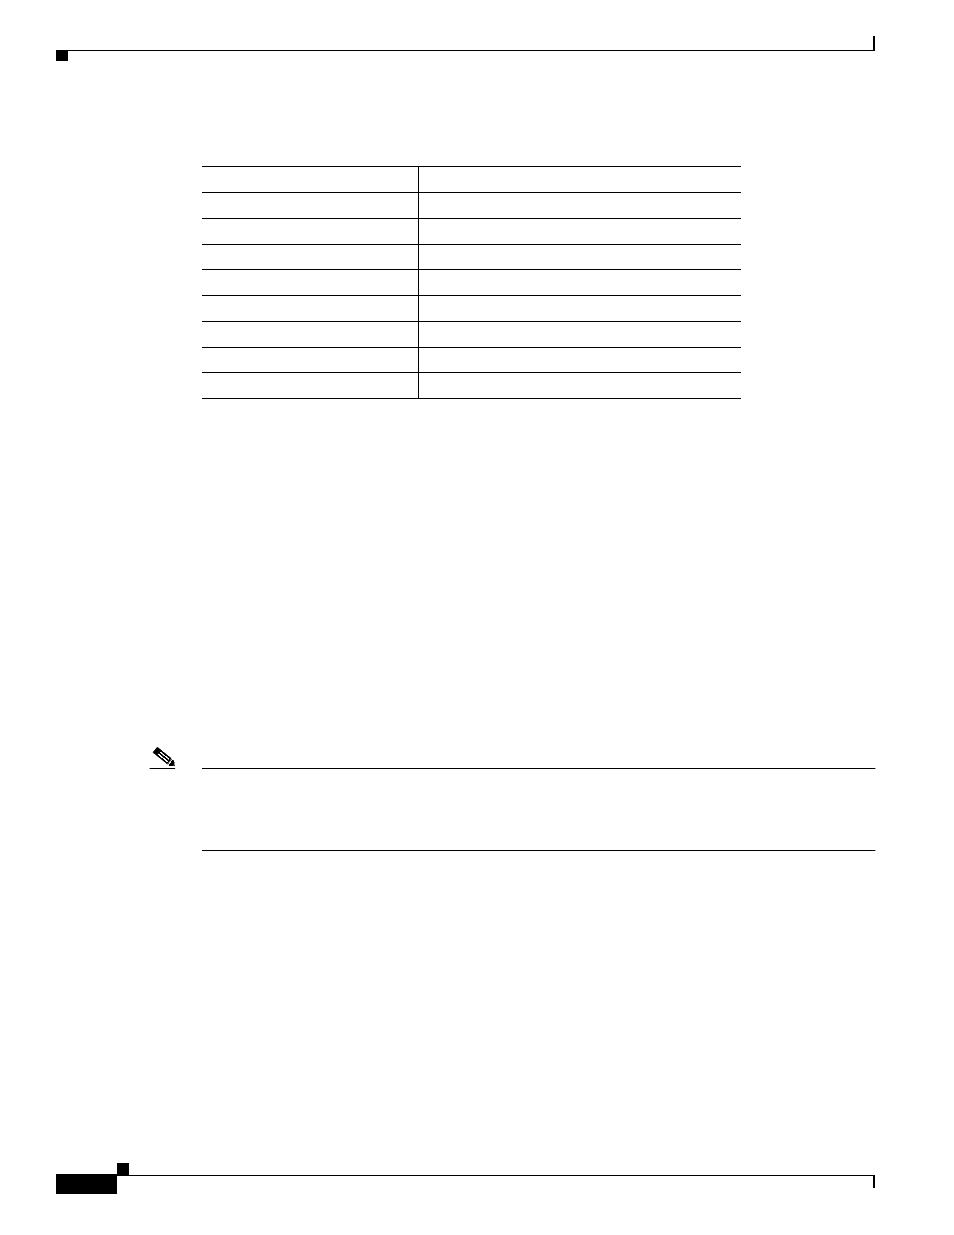 Configuration management traps   Cisco 12000/10700 V3 1 1 User